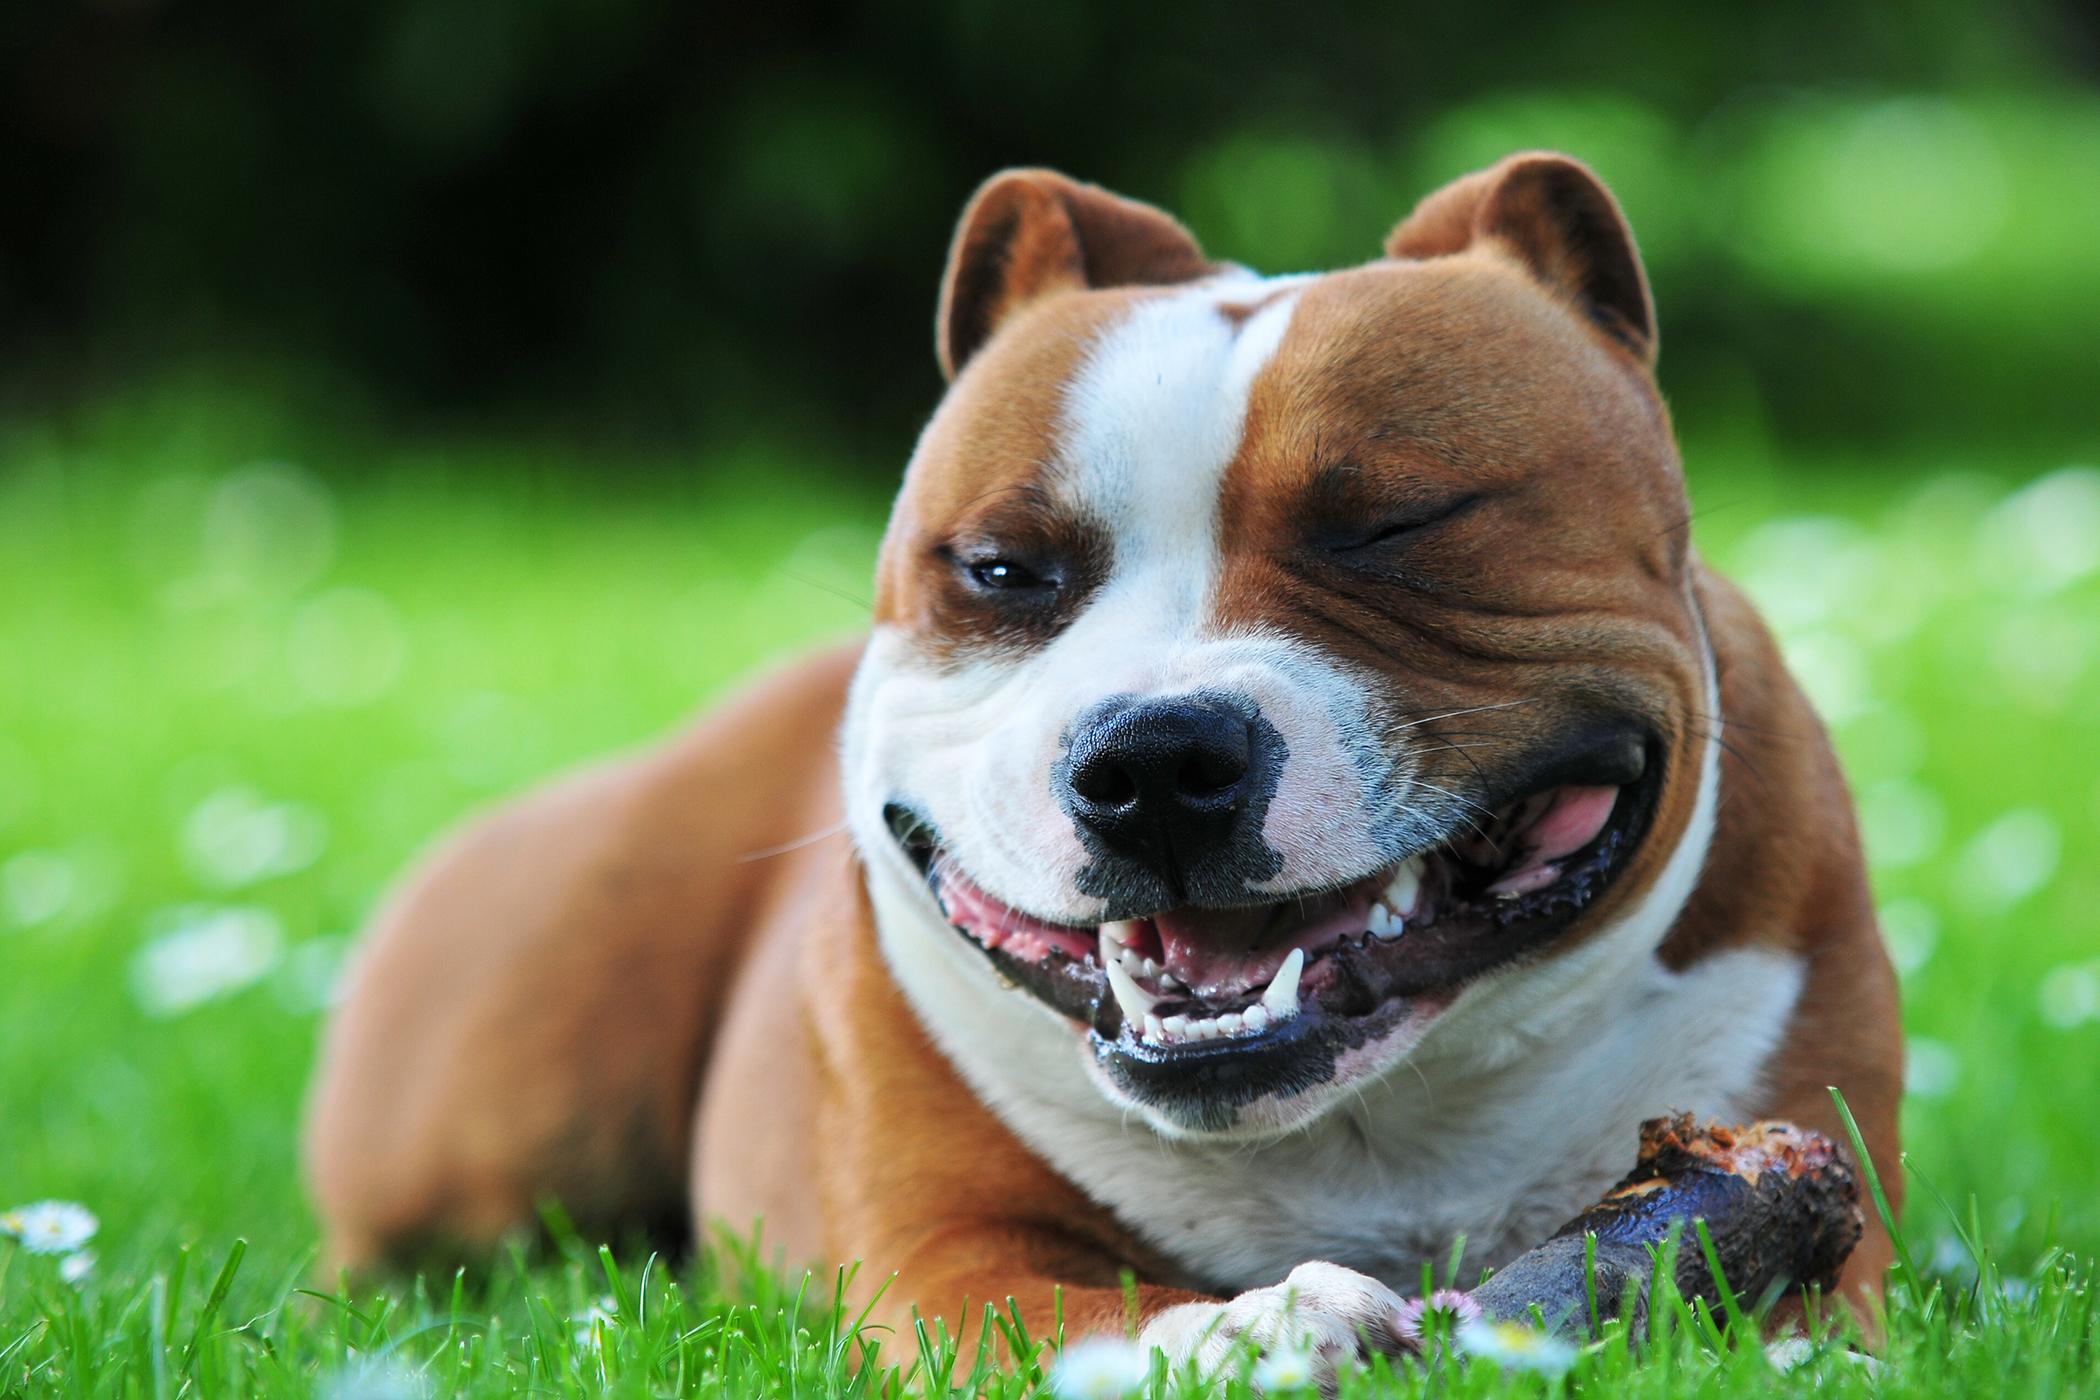 Cheiloplasty in Dogs